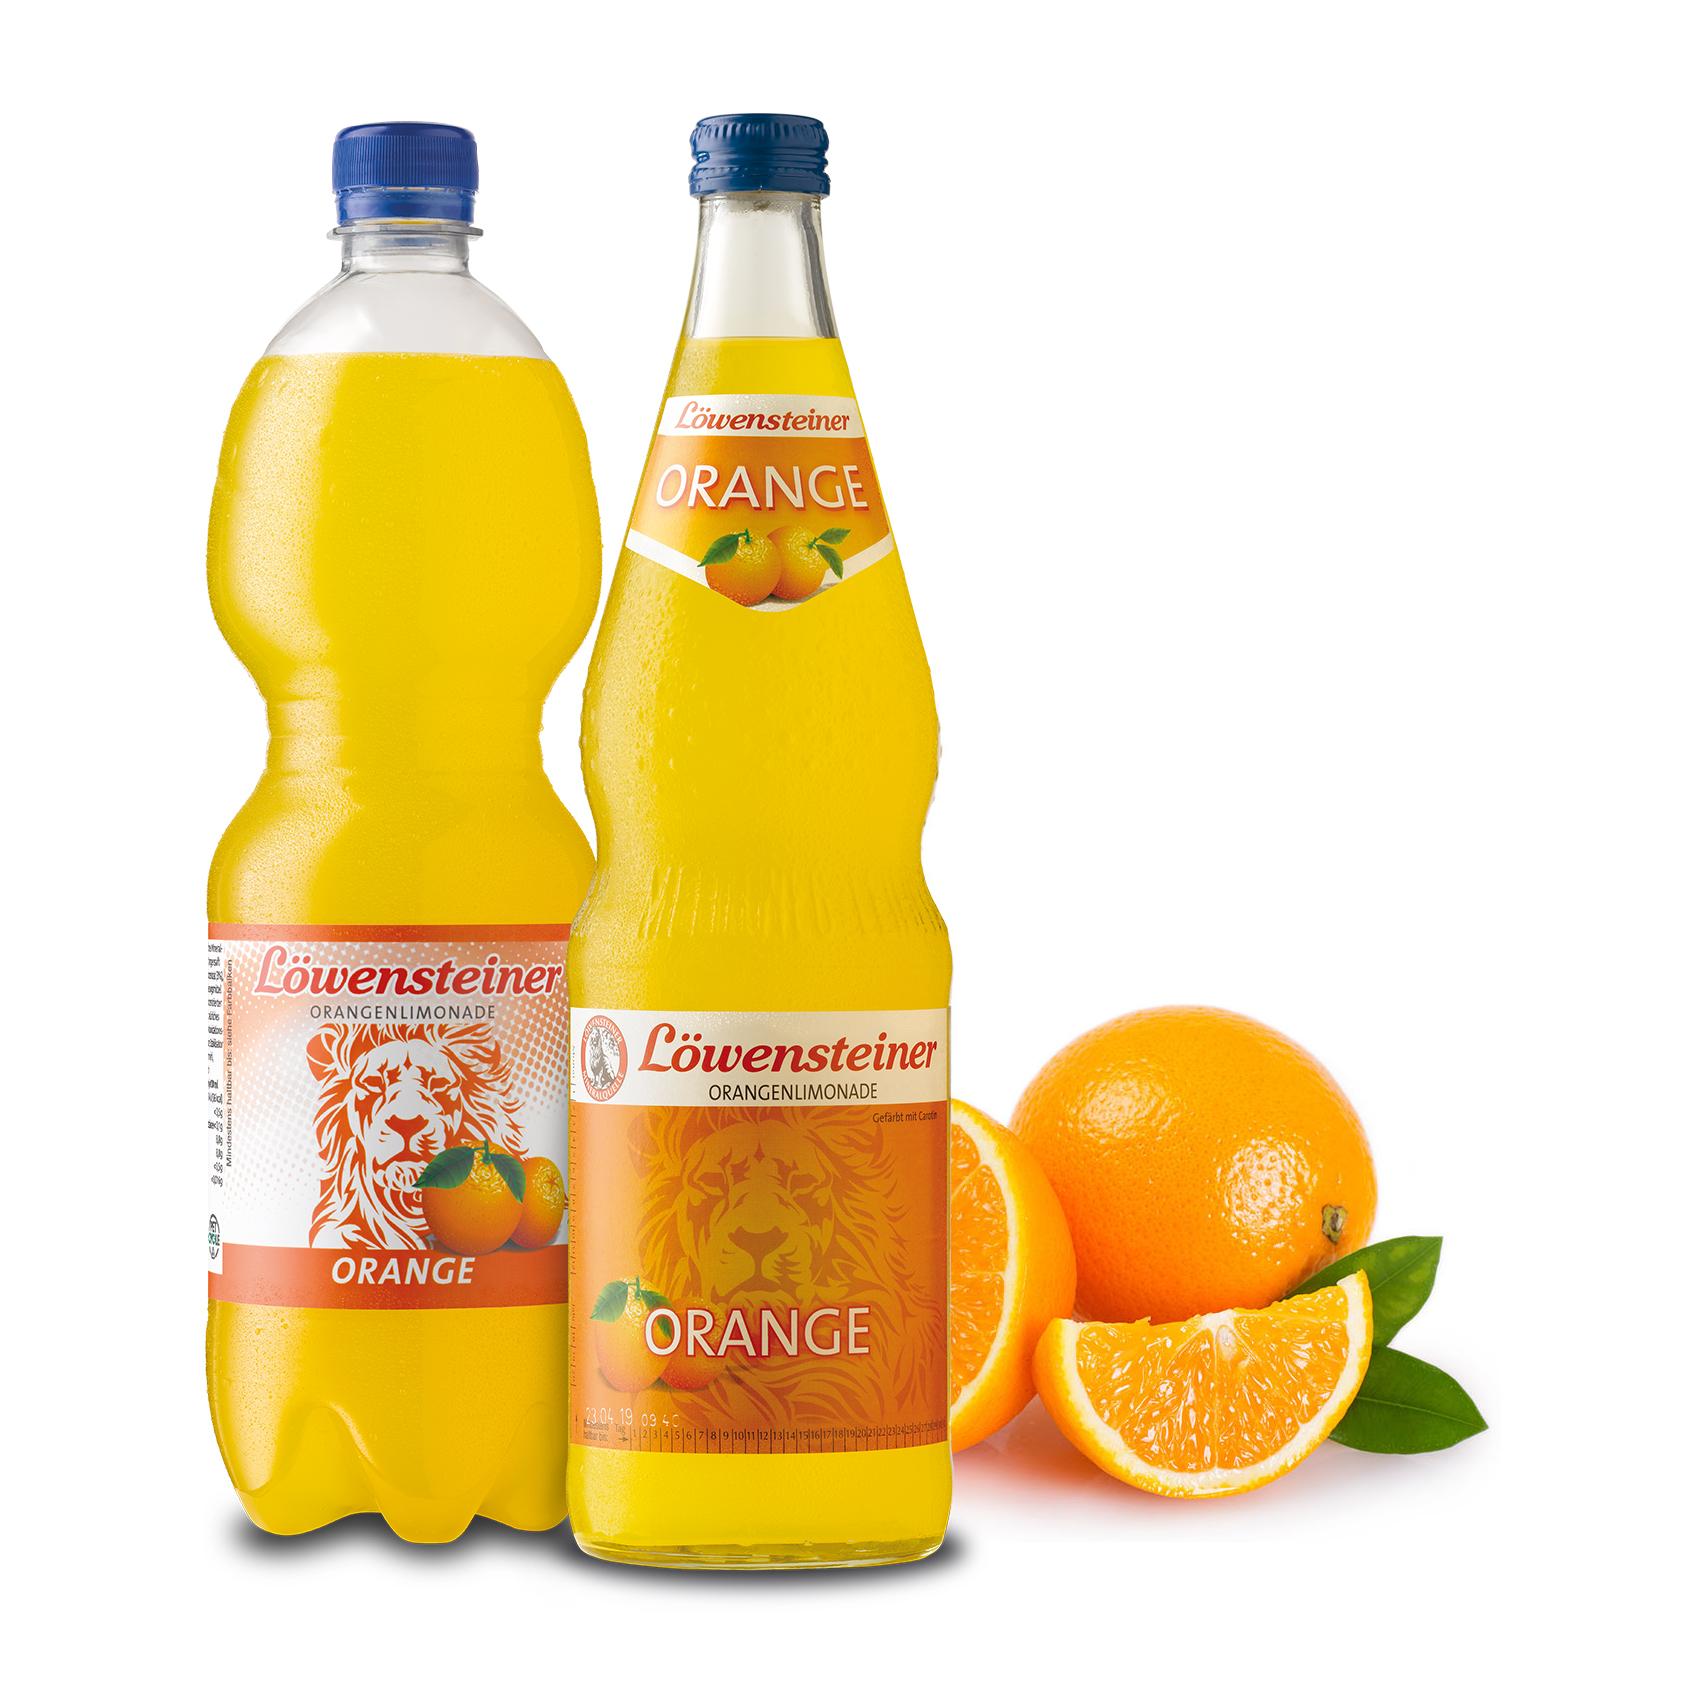 Orangenlimonade